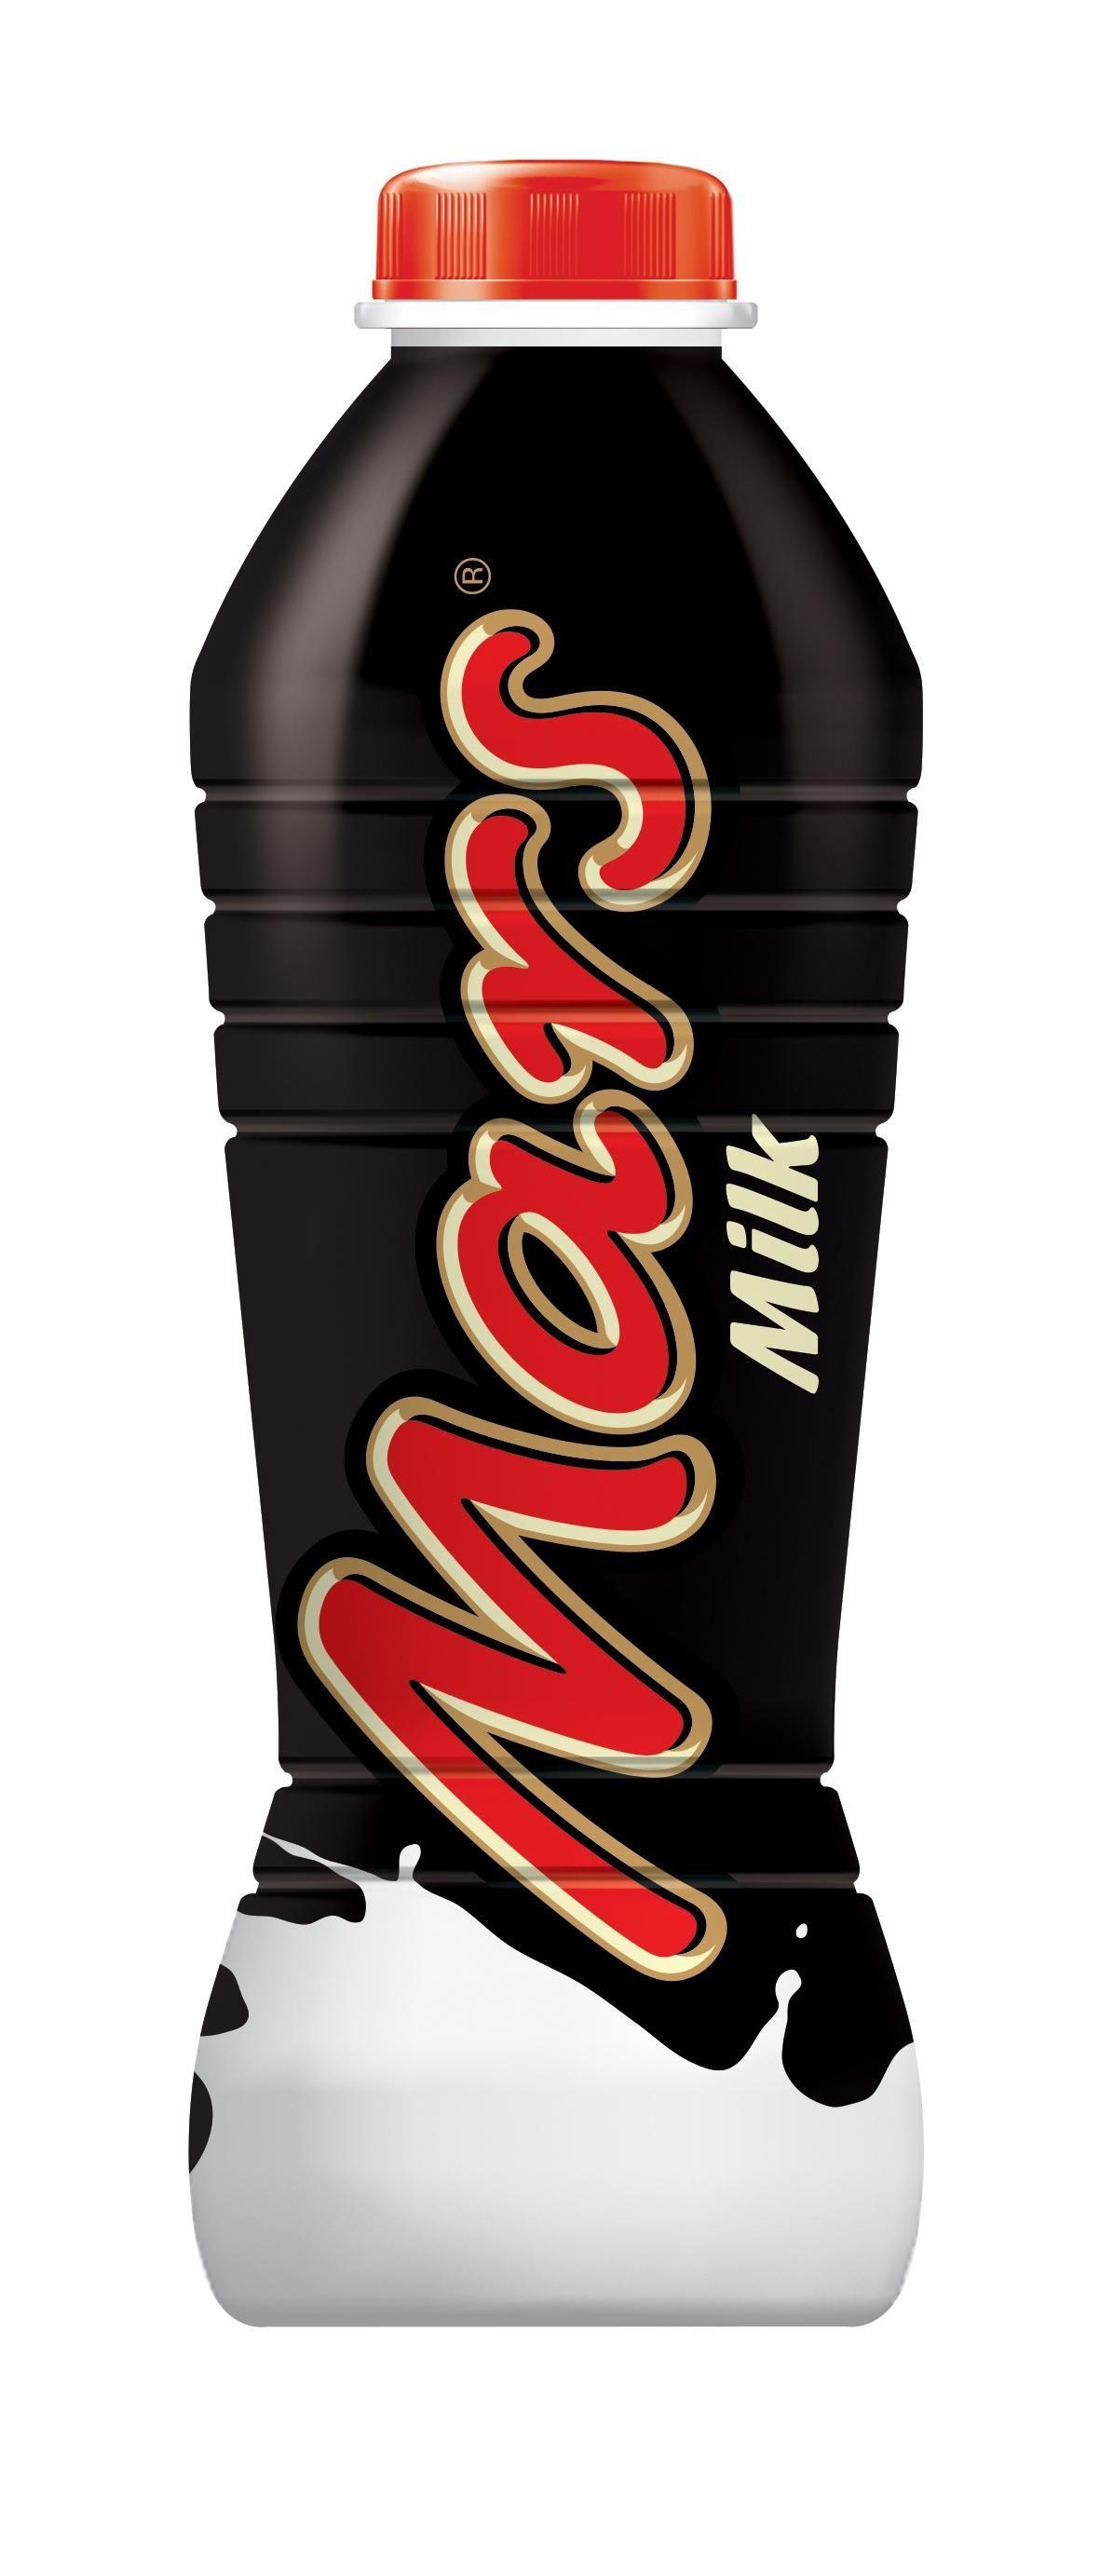 Mars Milk 750ml 79p instore @ Home Bargains